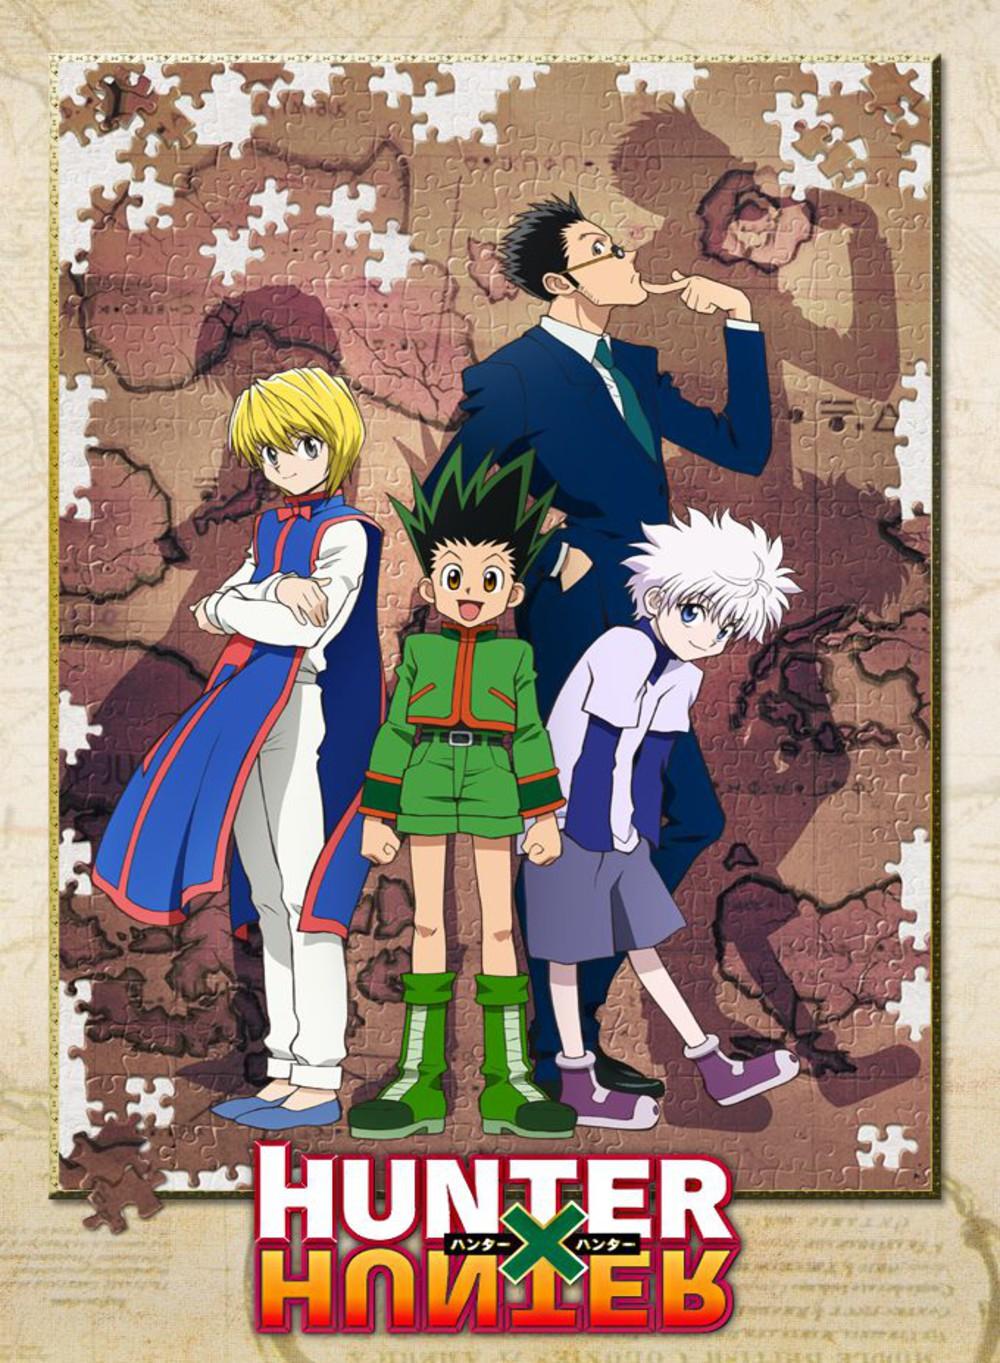 Hunter x hunter manga read